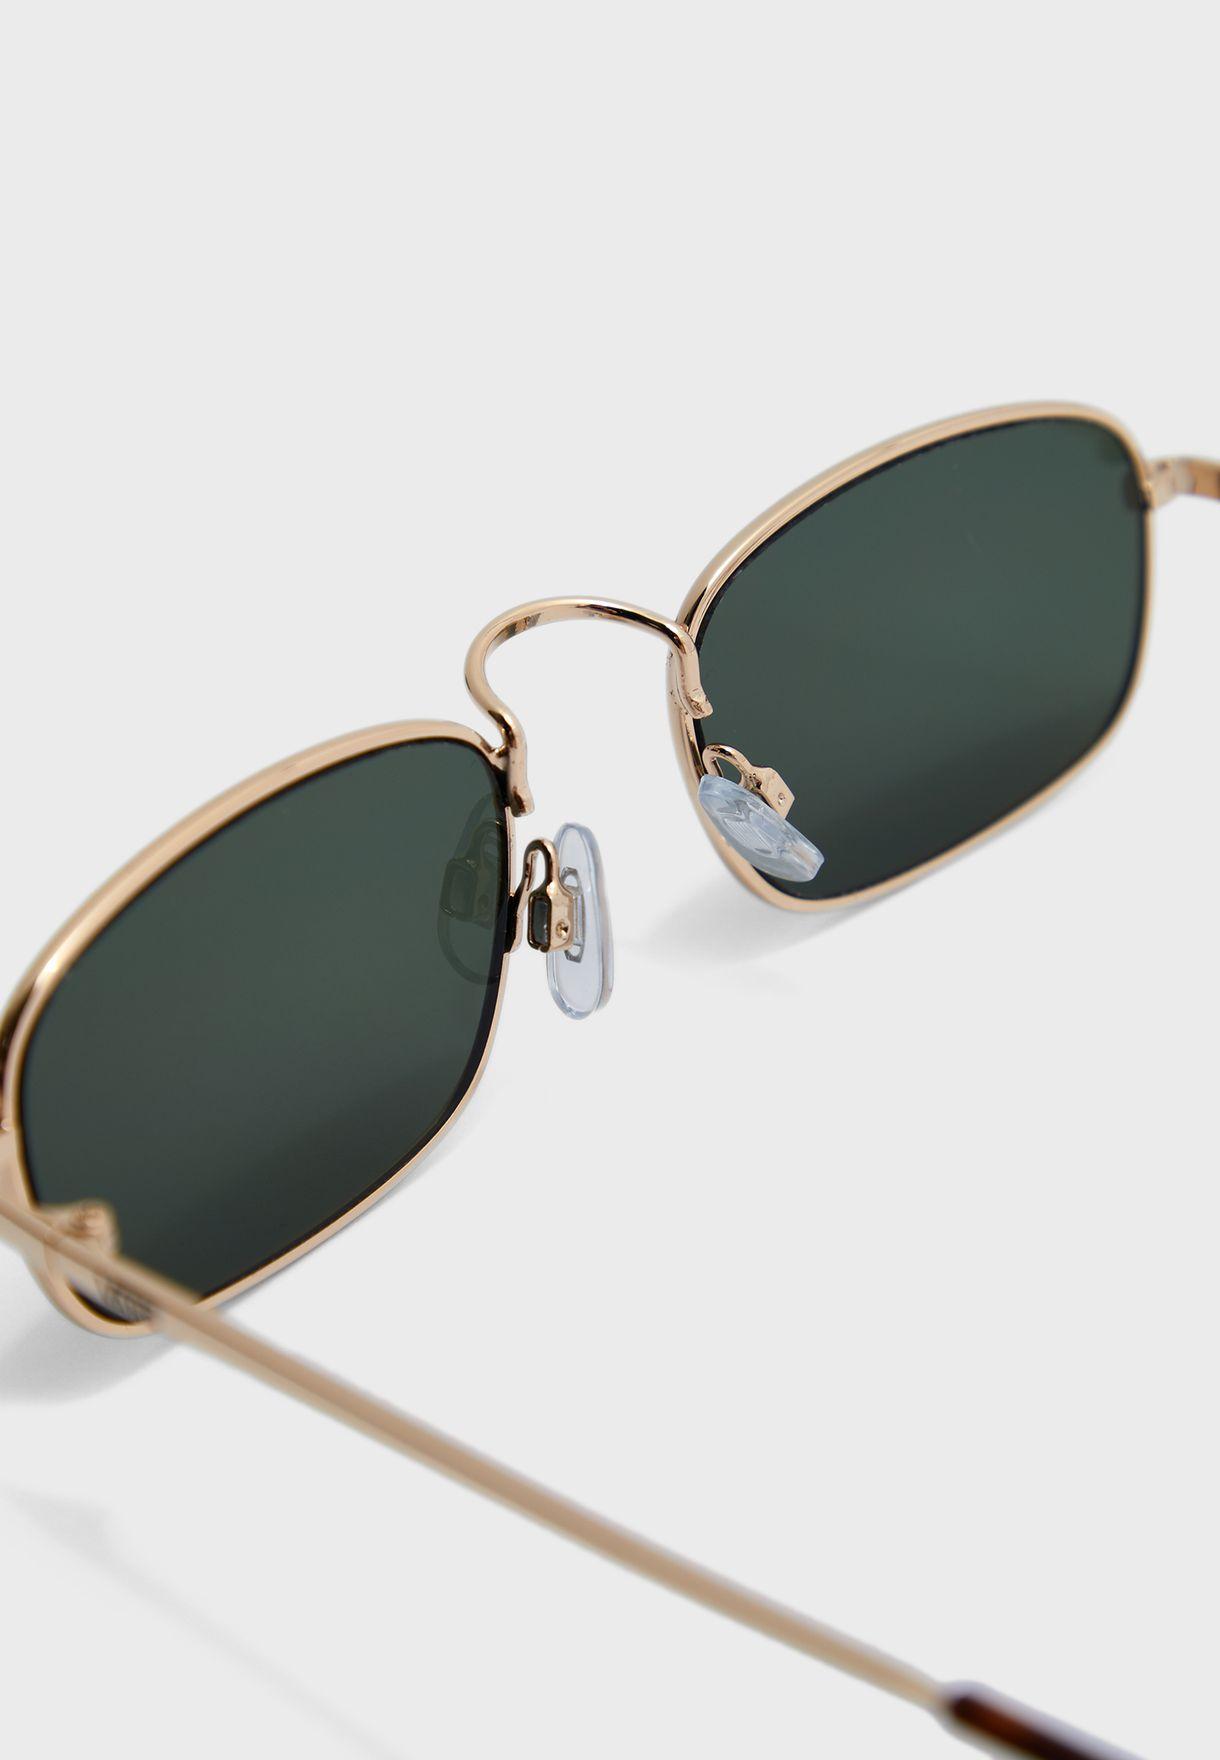 Four Square Sunglasses